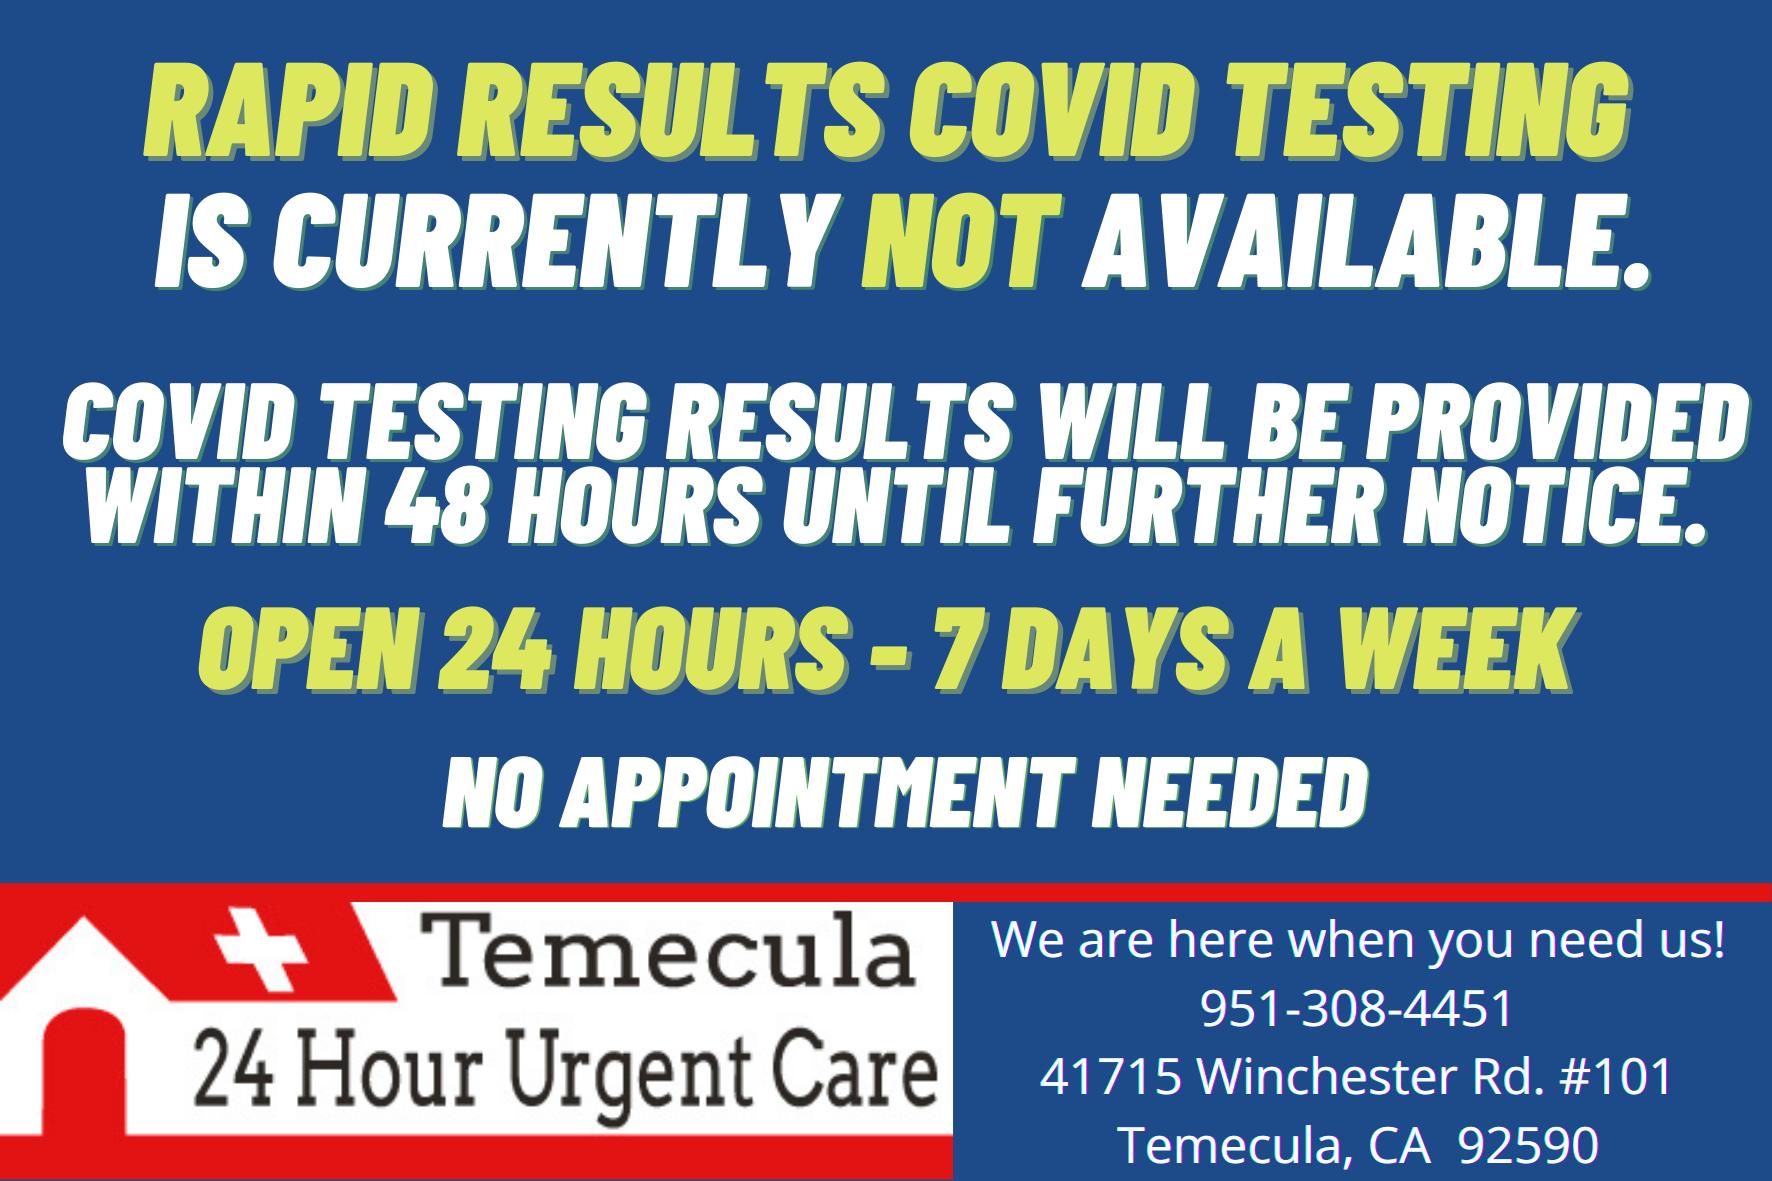 Covid Testing Temecula 24 Hour Urgent Care